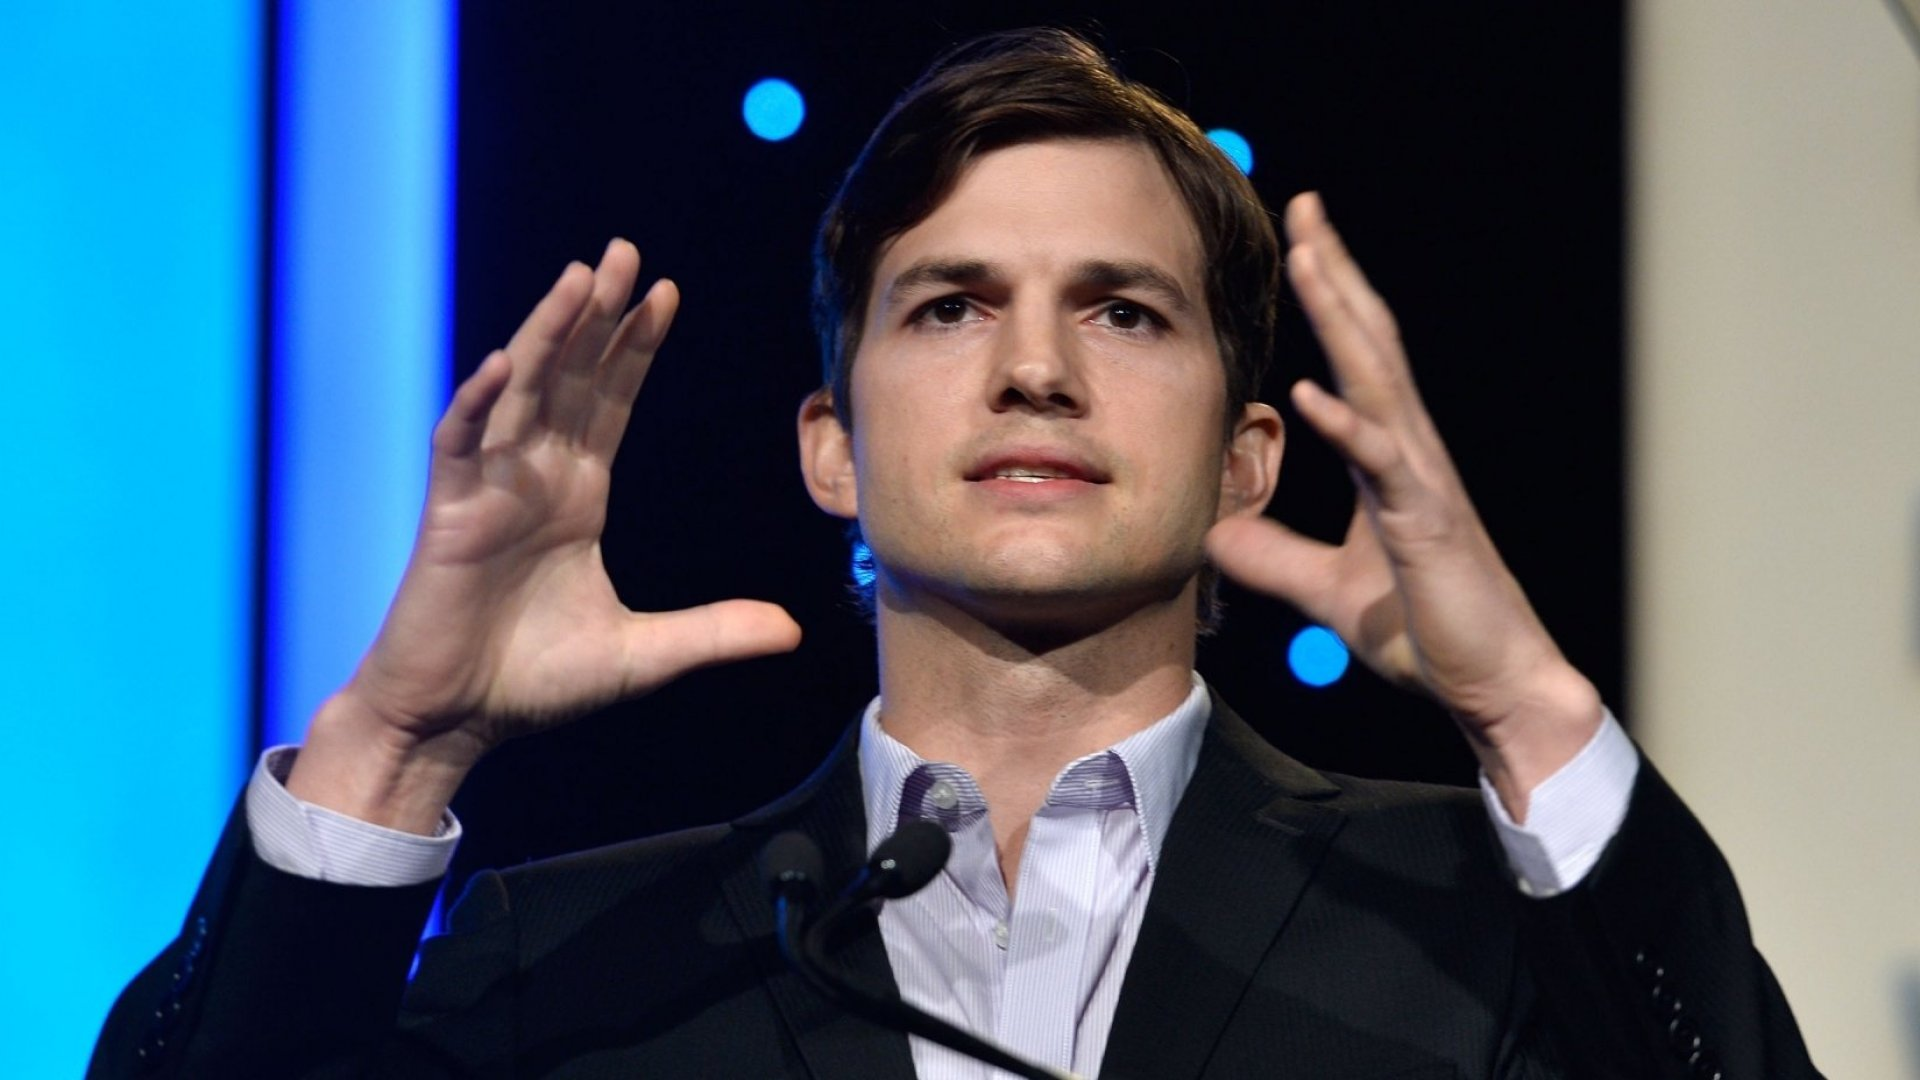 Actor Ashton Kutcher Leads the List of Most Active Celebrity Investors